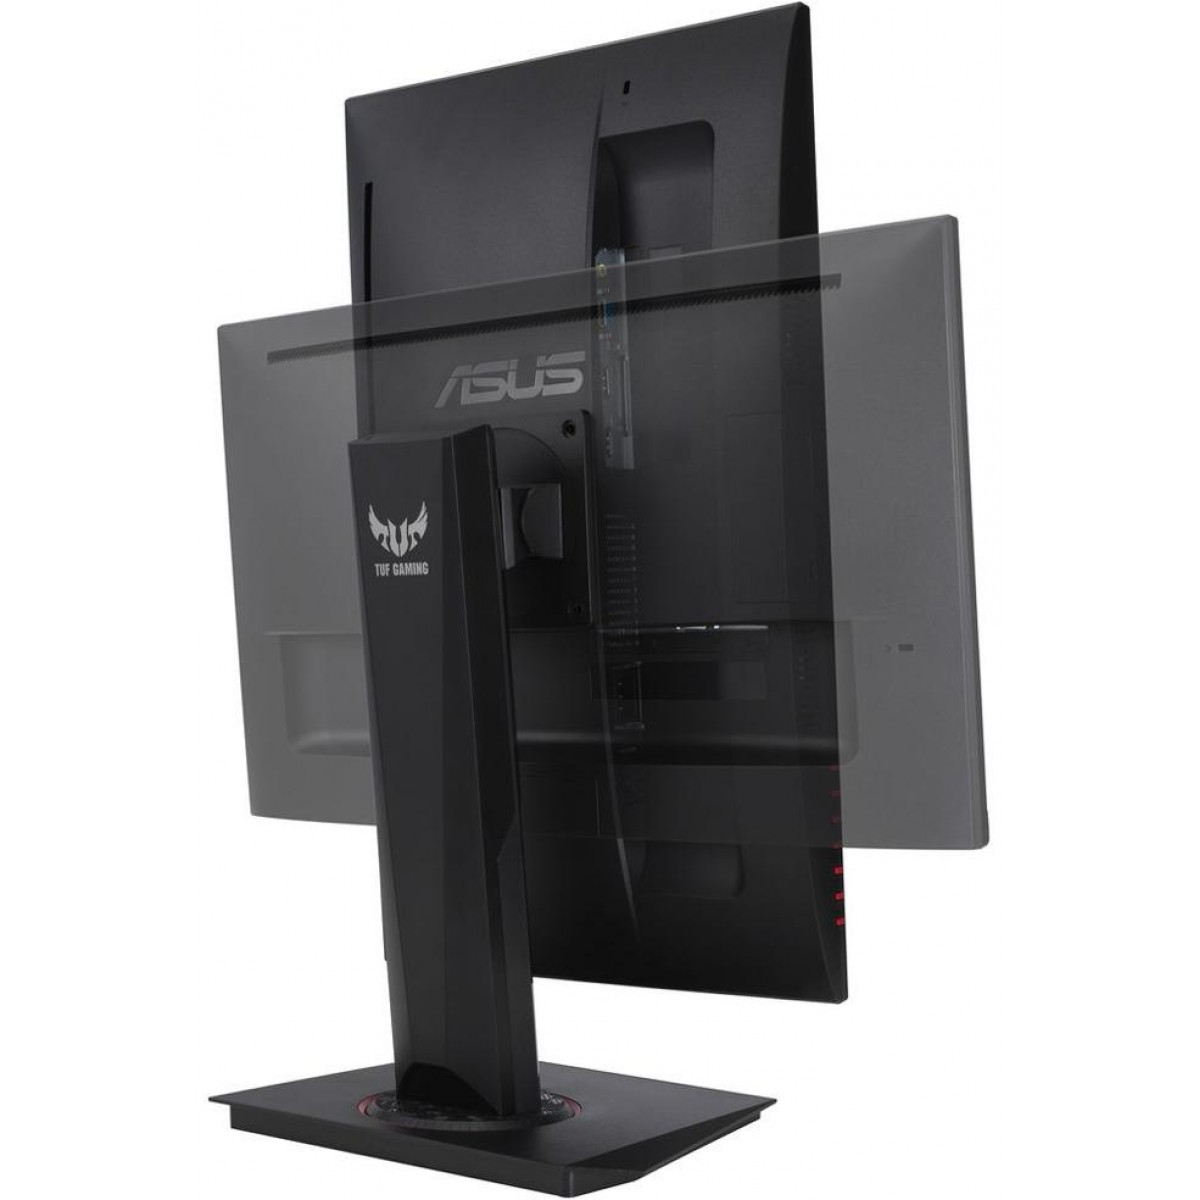 Monitor Gamer Asus TUF Gaming Led 23,8 Pol, Widescreen, Full HD, 144Hz, 1ms, IPS, HDMI, DisplayPort, FreeSync, VG249Q